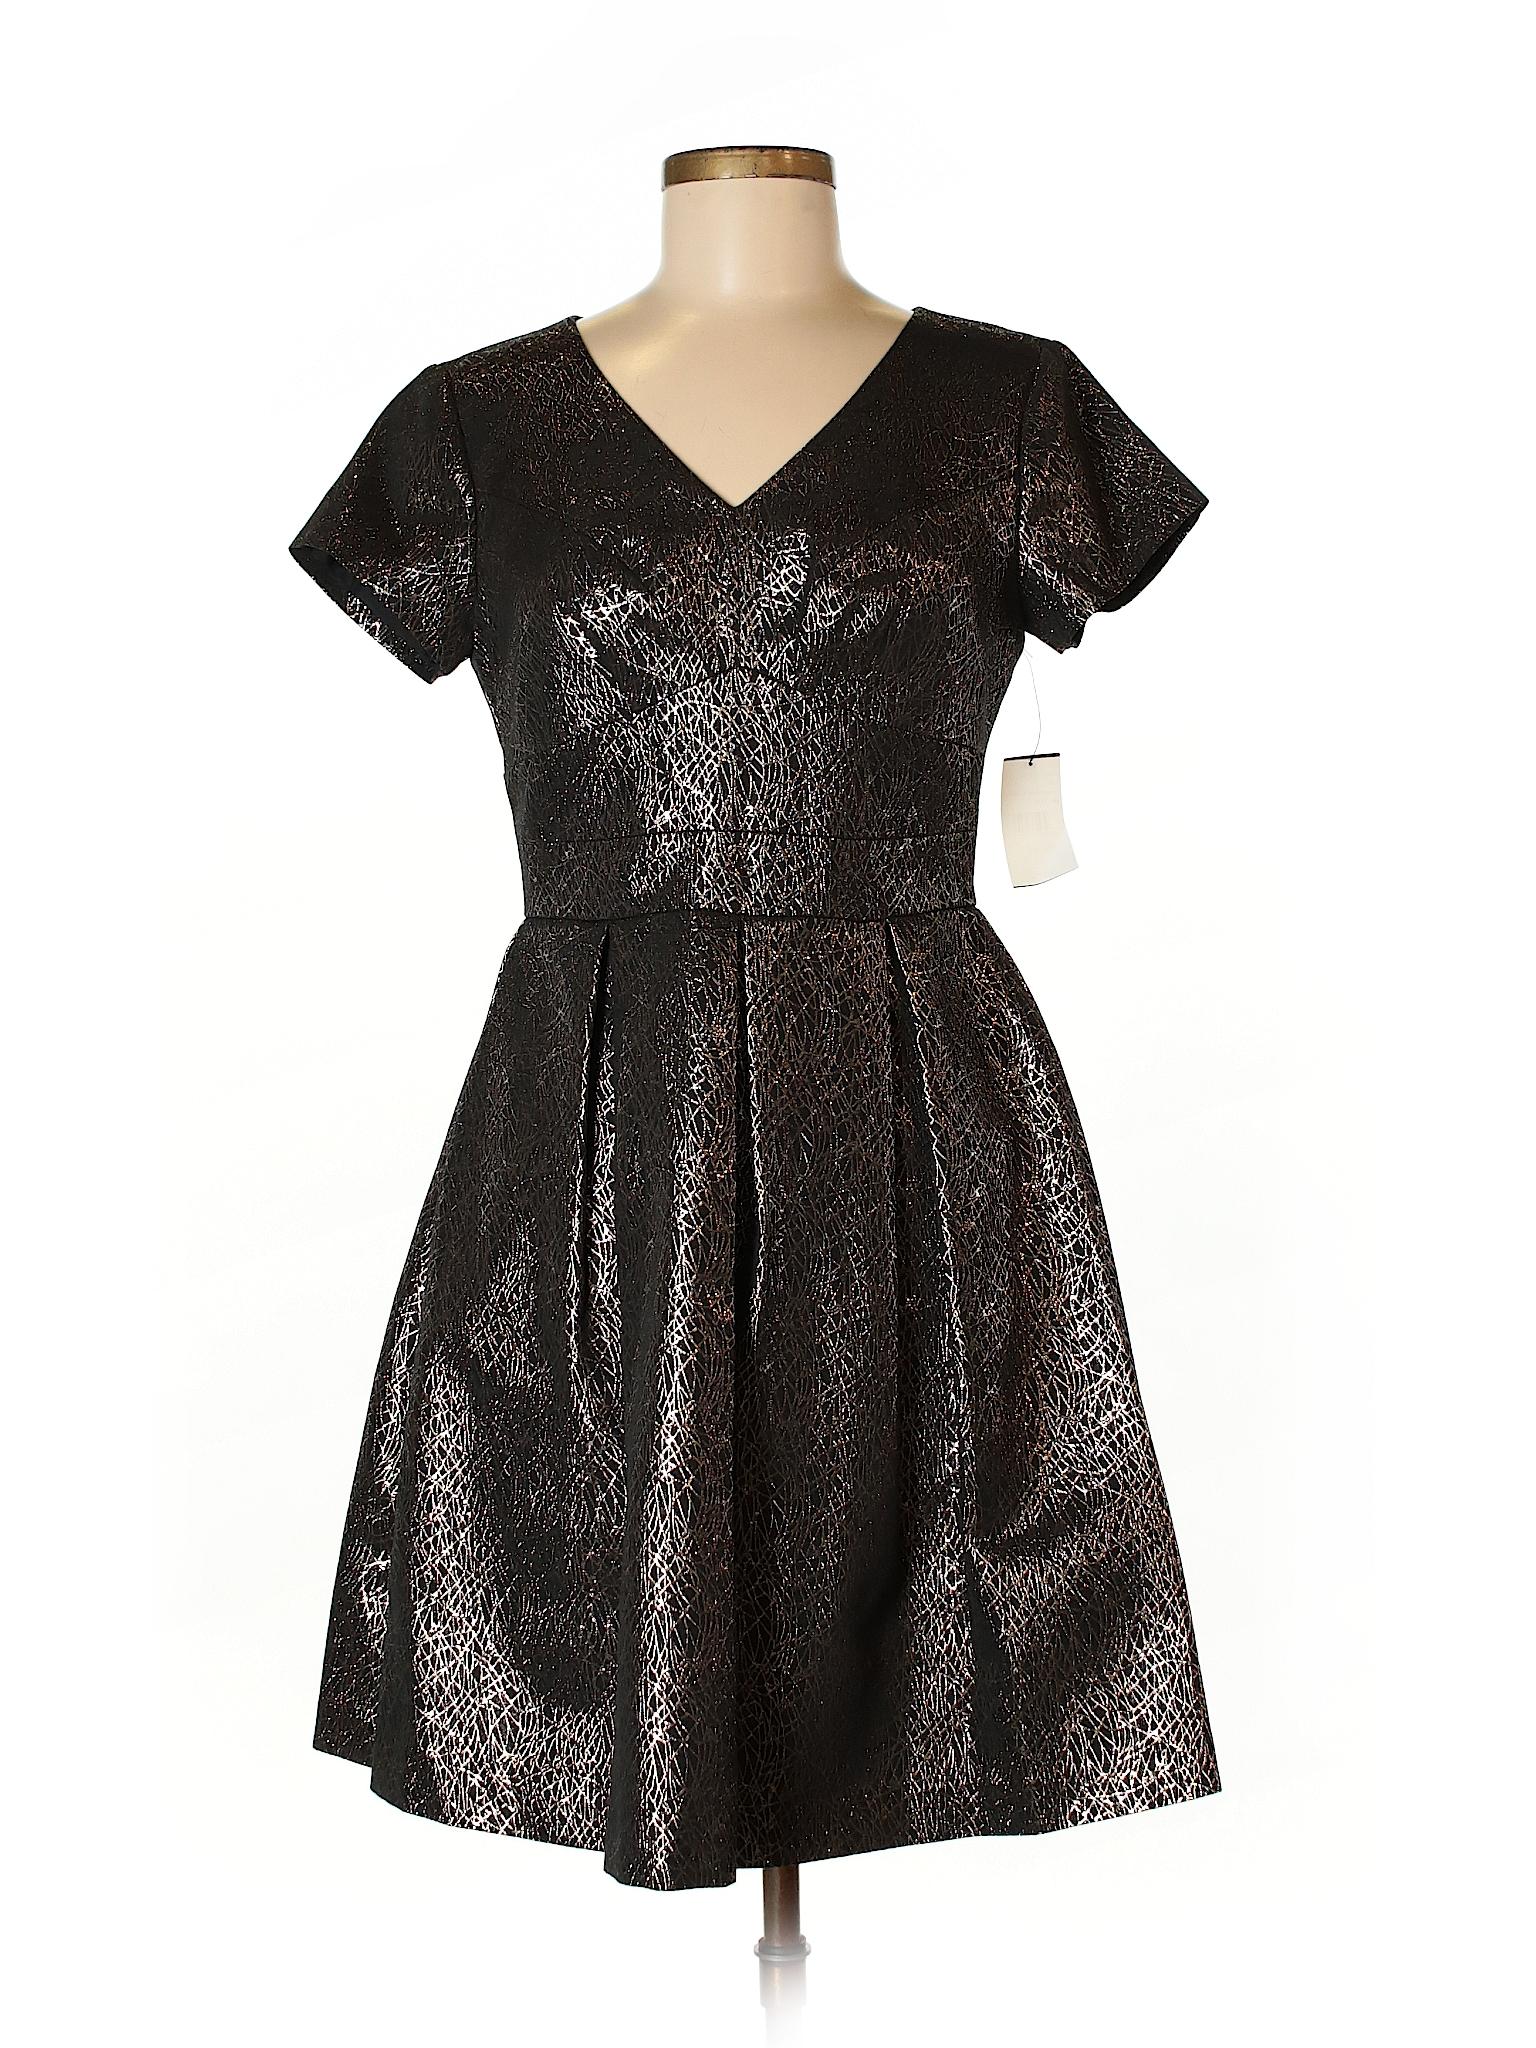 Vince Dress winter Boutique Casual Camuto qfwHH0x